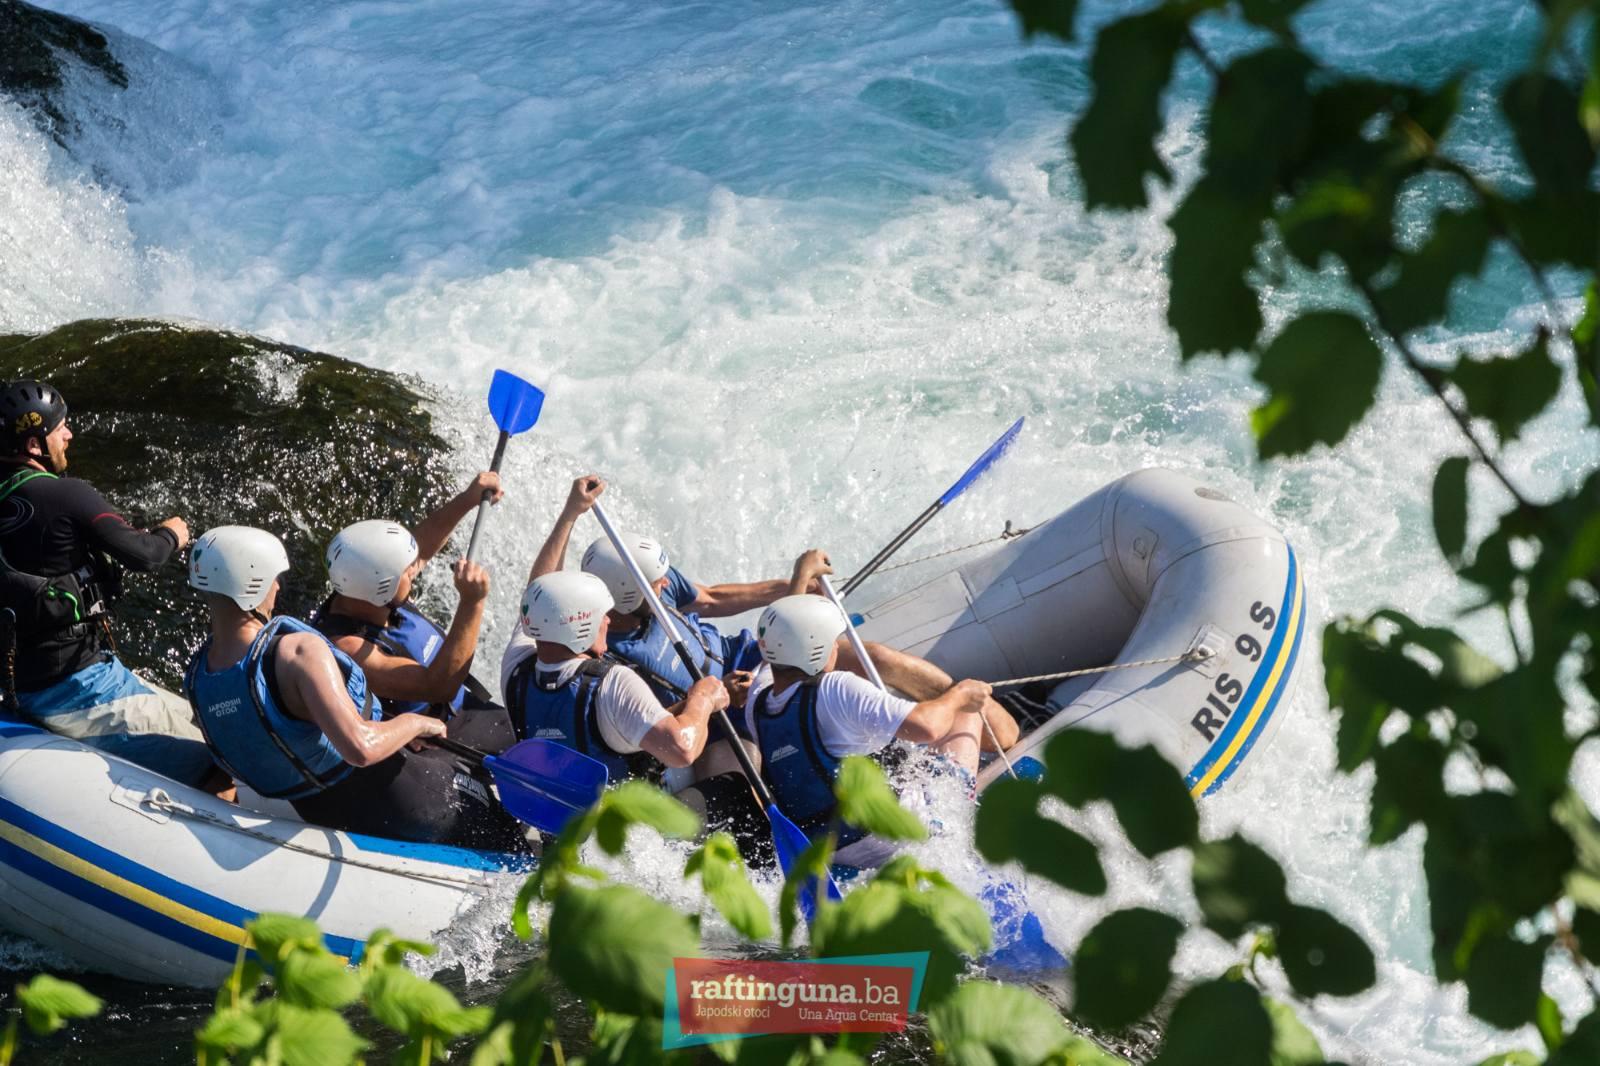 rafting Una